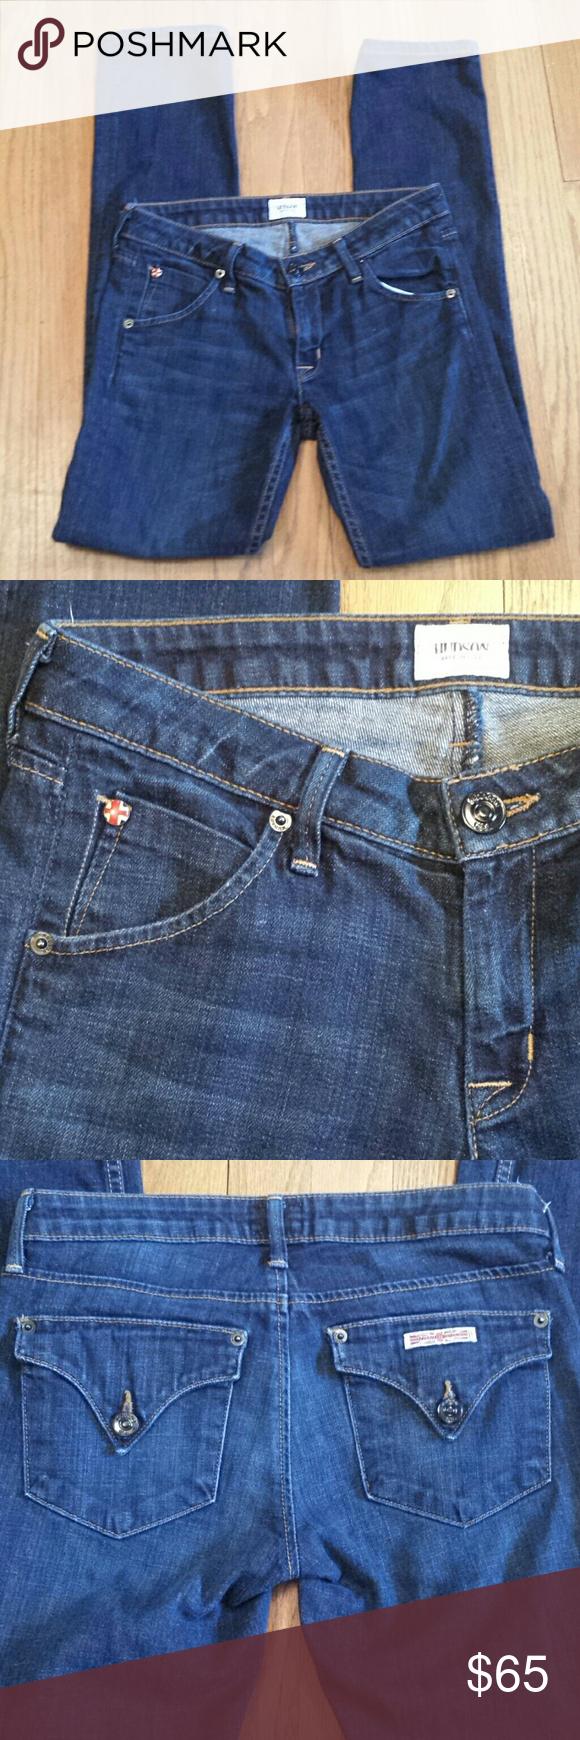 Hudson Jeans Size 25 Hudson Carly Flap Straight Jeans!  Great condition! Hudson Jeans Jeans Straight Leg